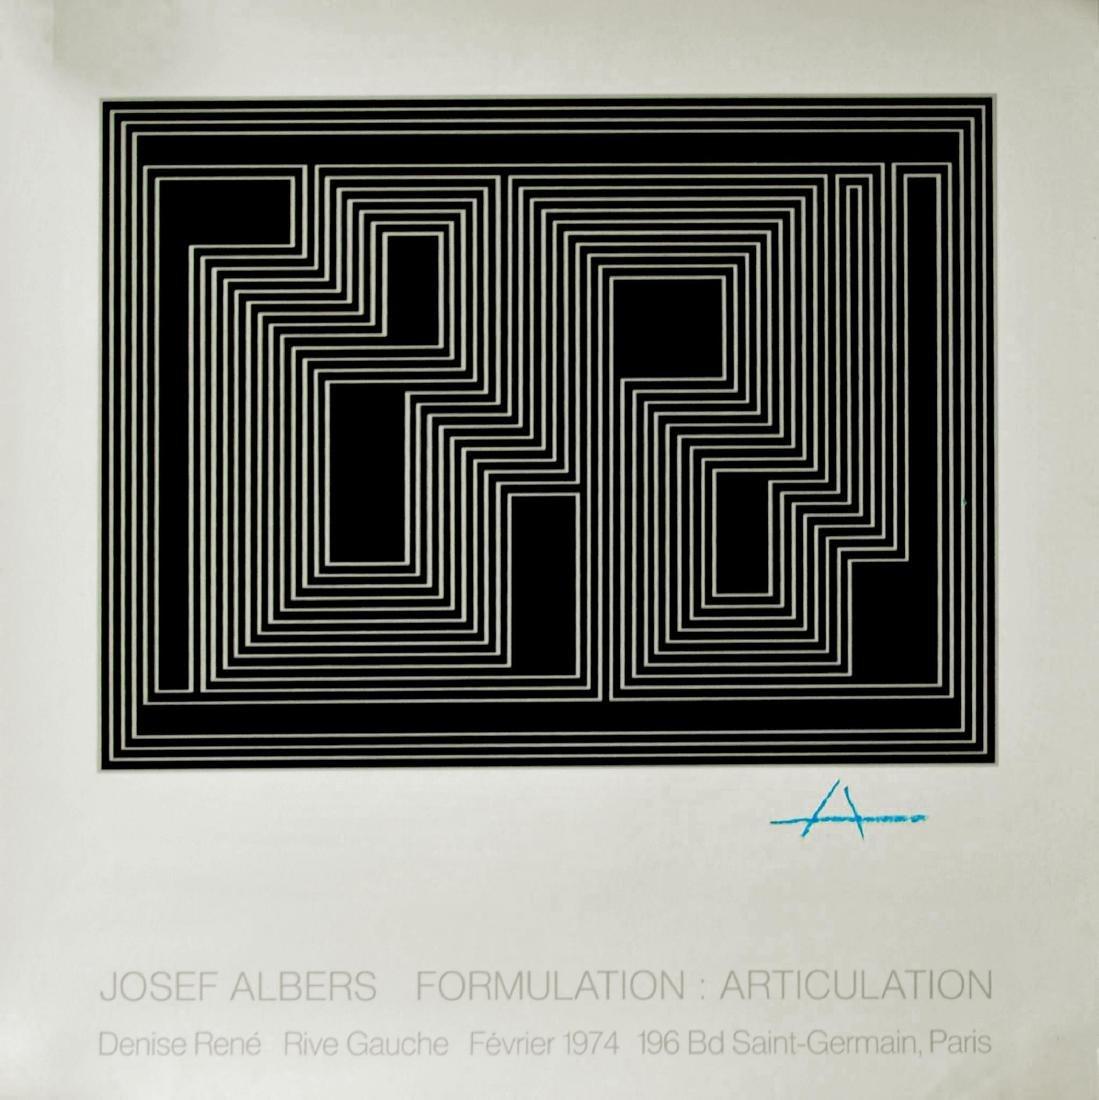 1656: JOSEF ALBERS - Josef Albers: Formulation -